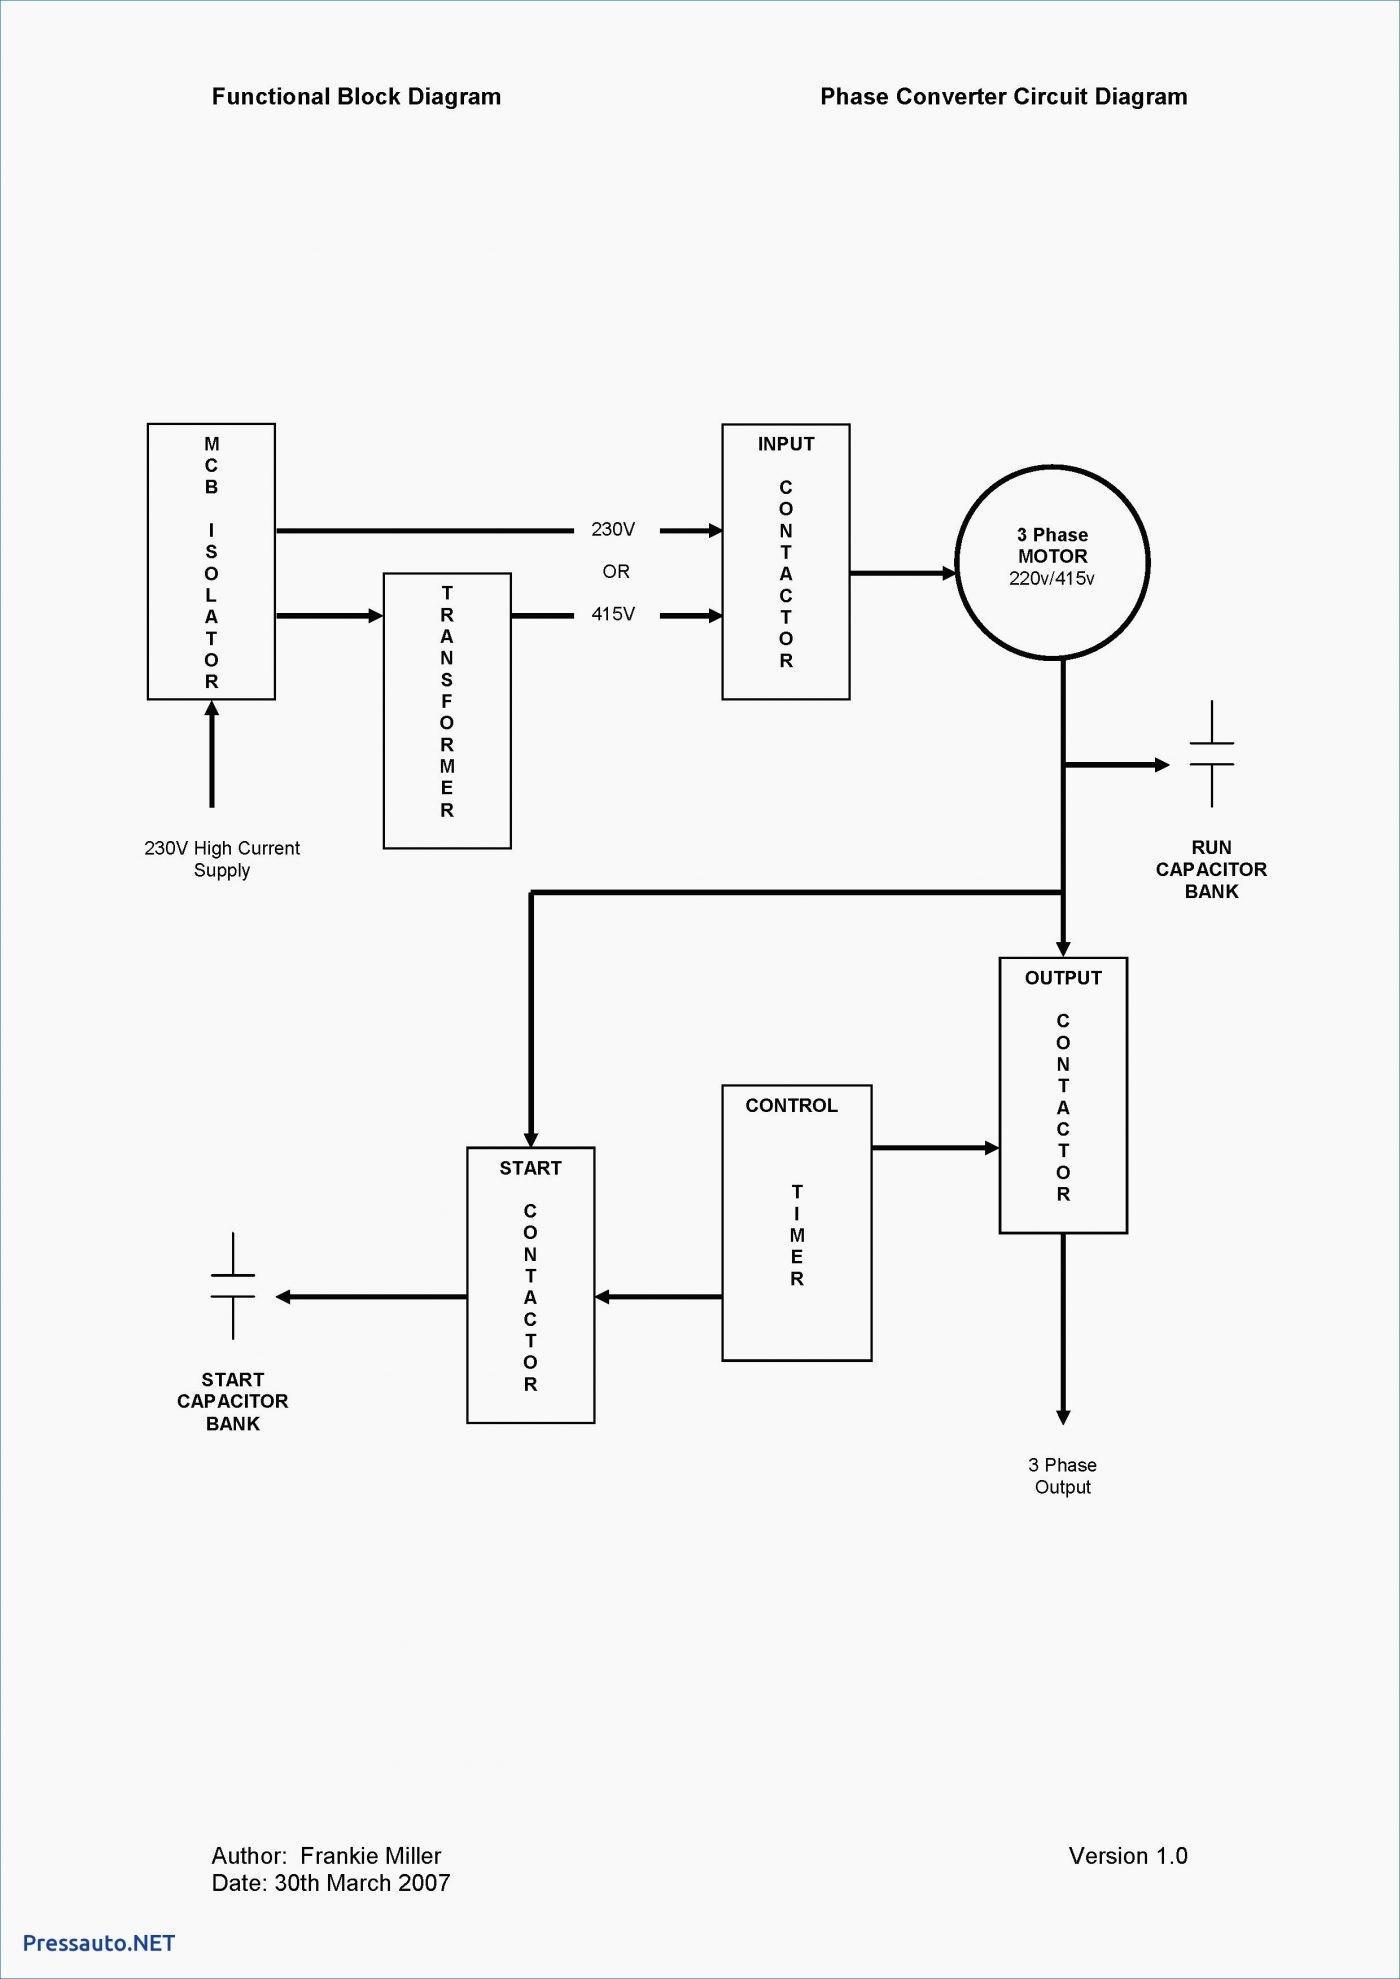 230V Single Phase Wiring Diagram | Wiring Diagram - Wiring Diagram For 230V Single Phase Motor